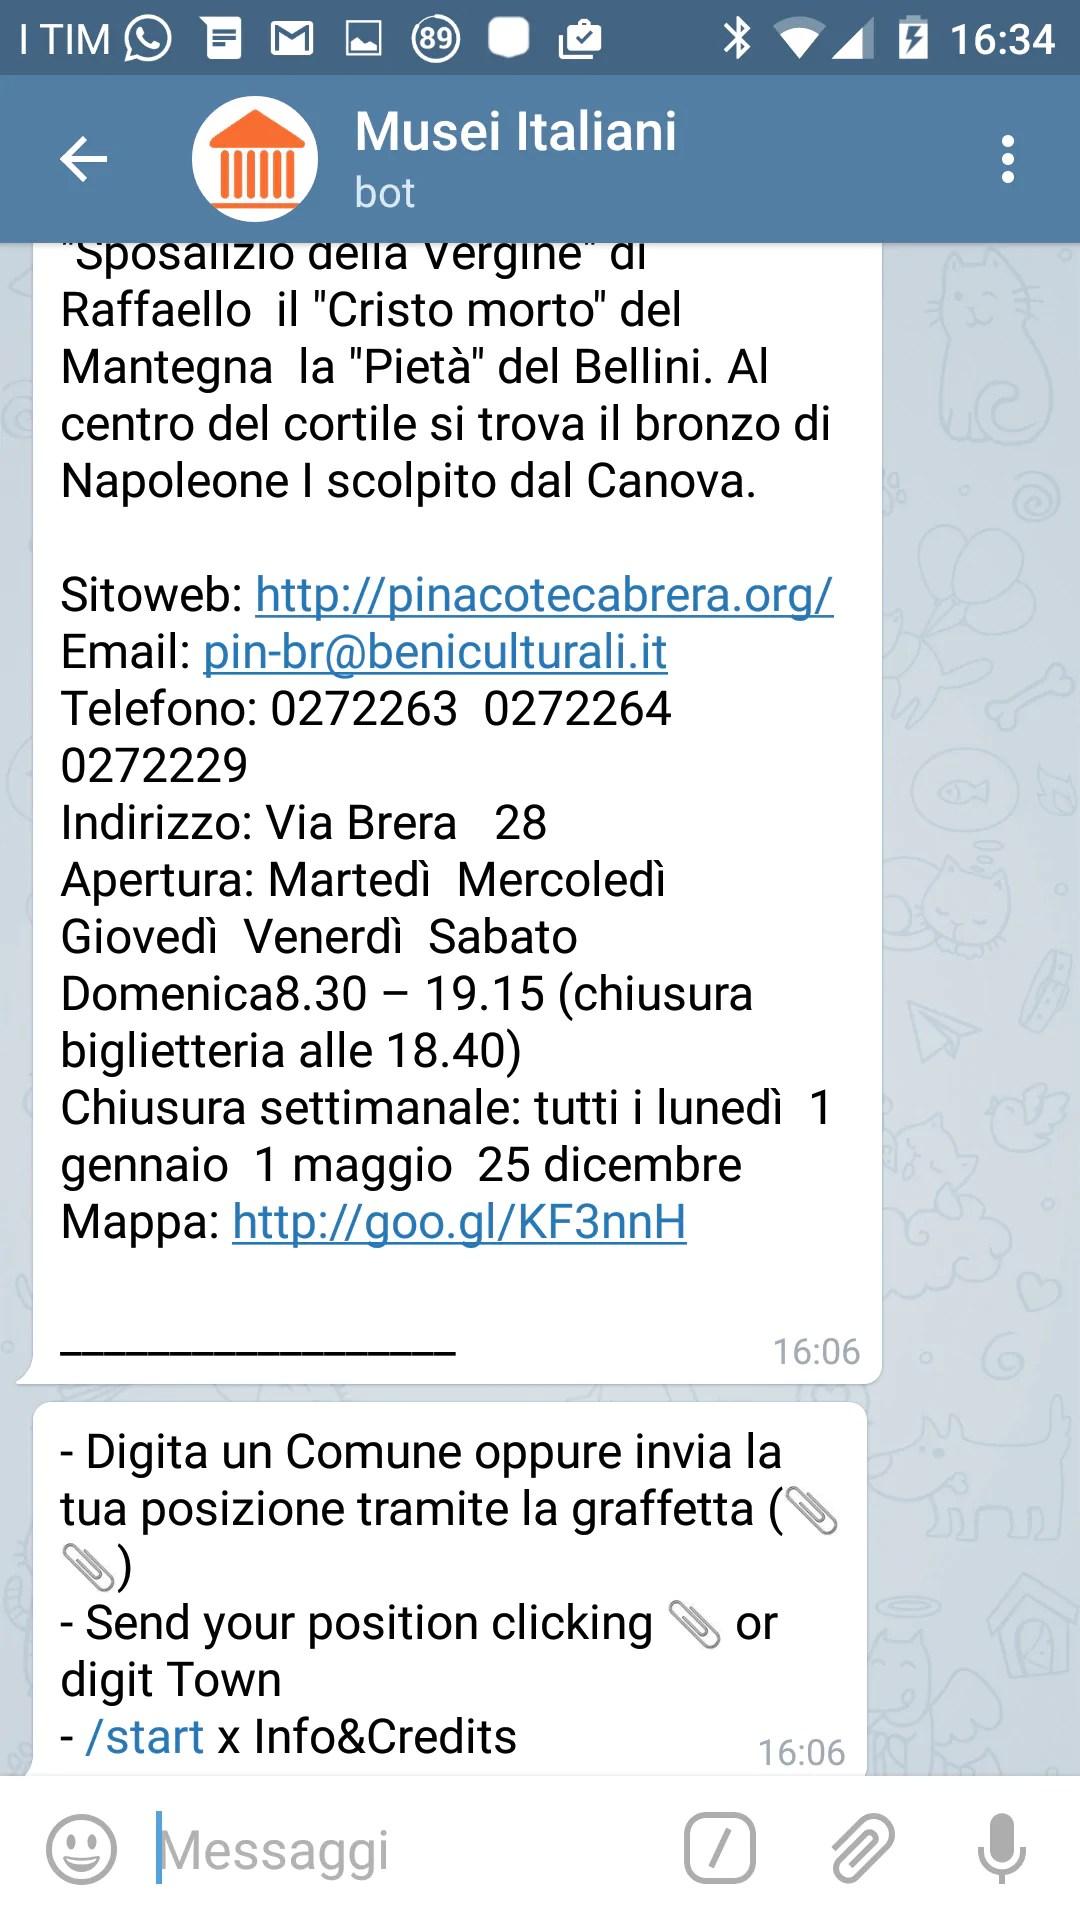 Telegram: caccia ai bot più utili 5